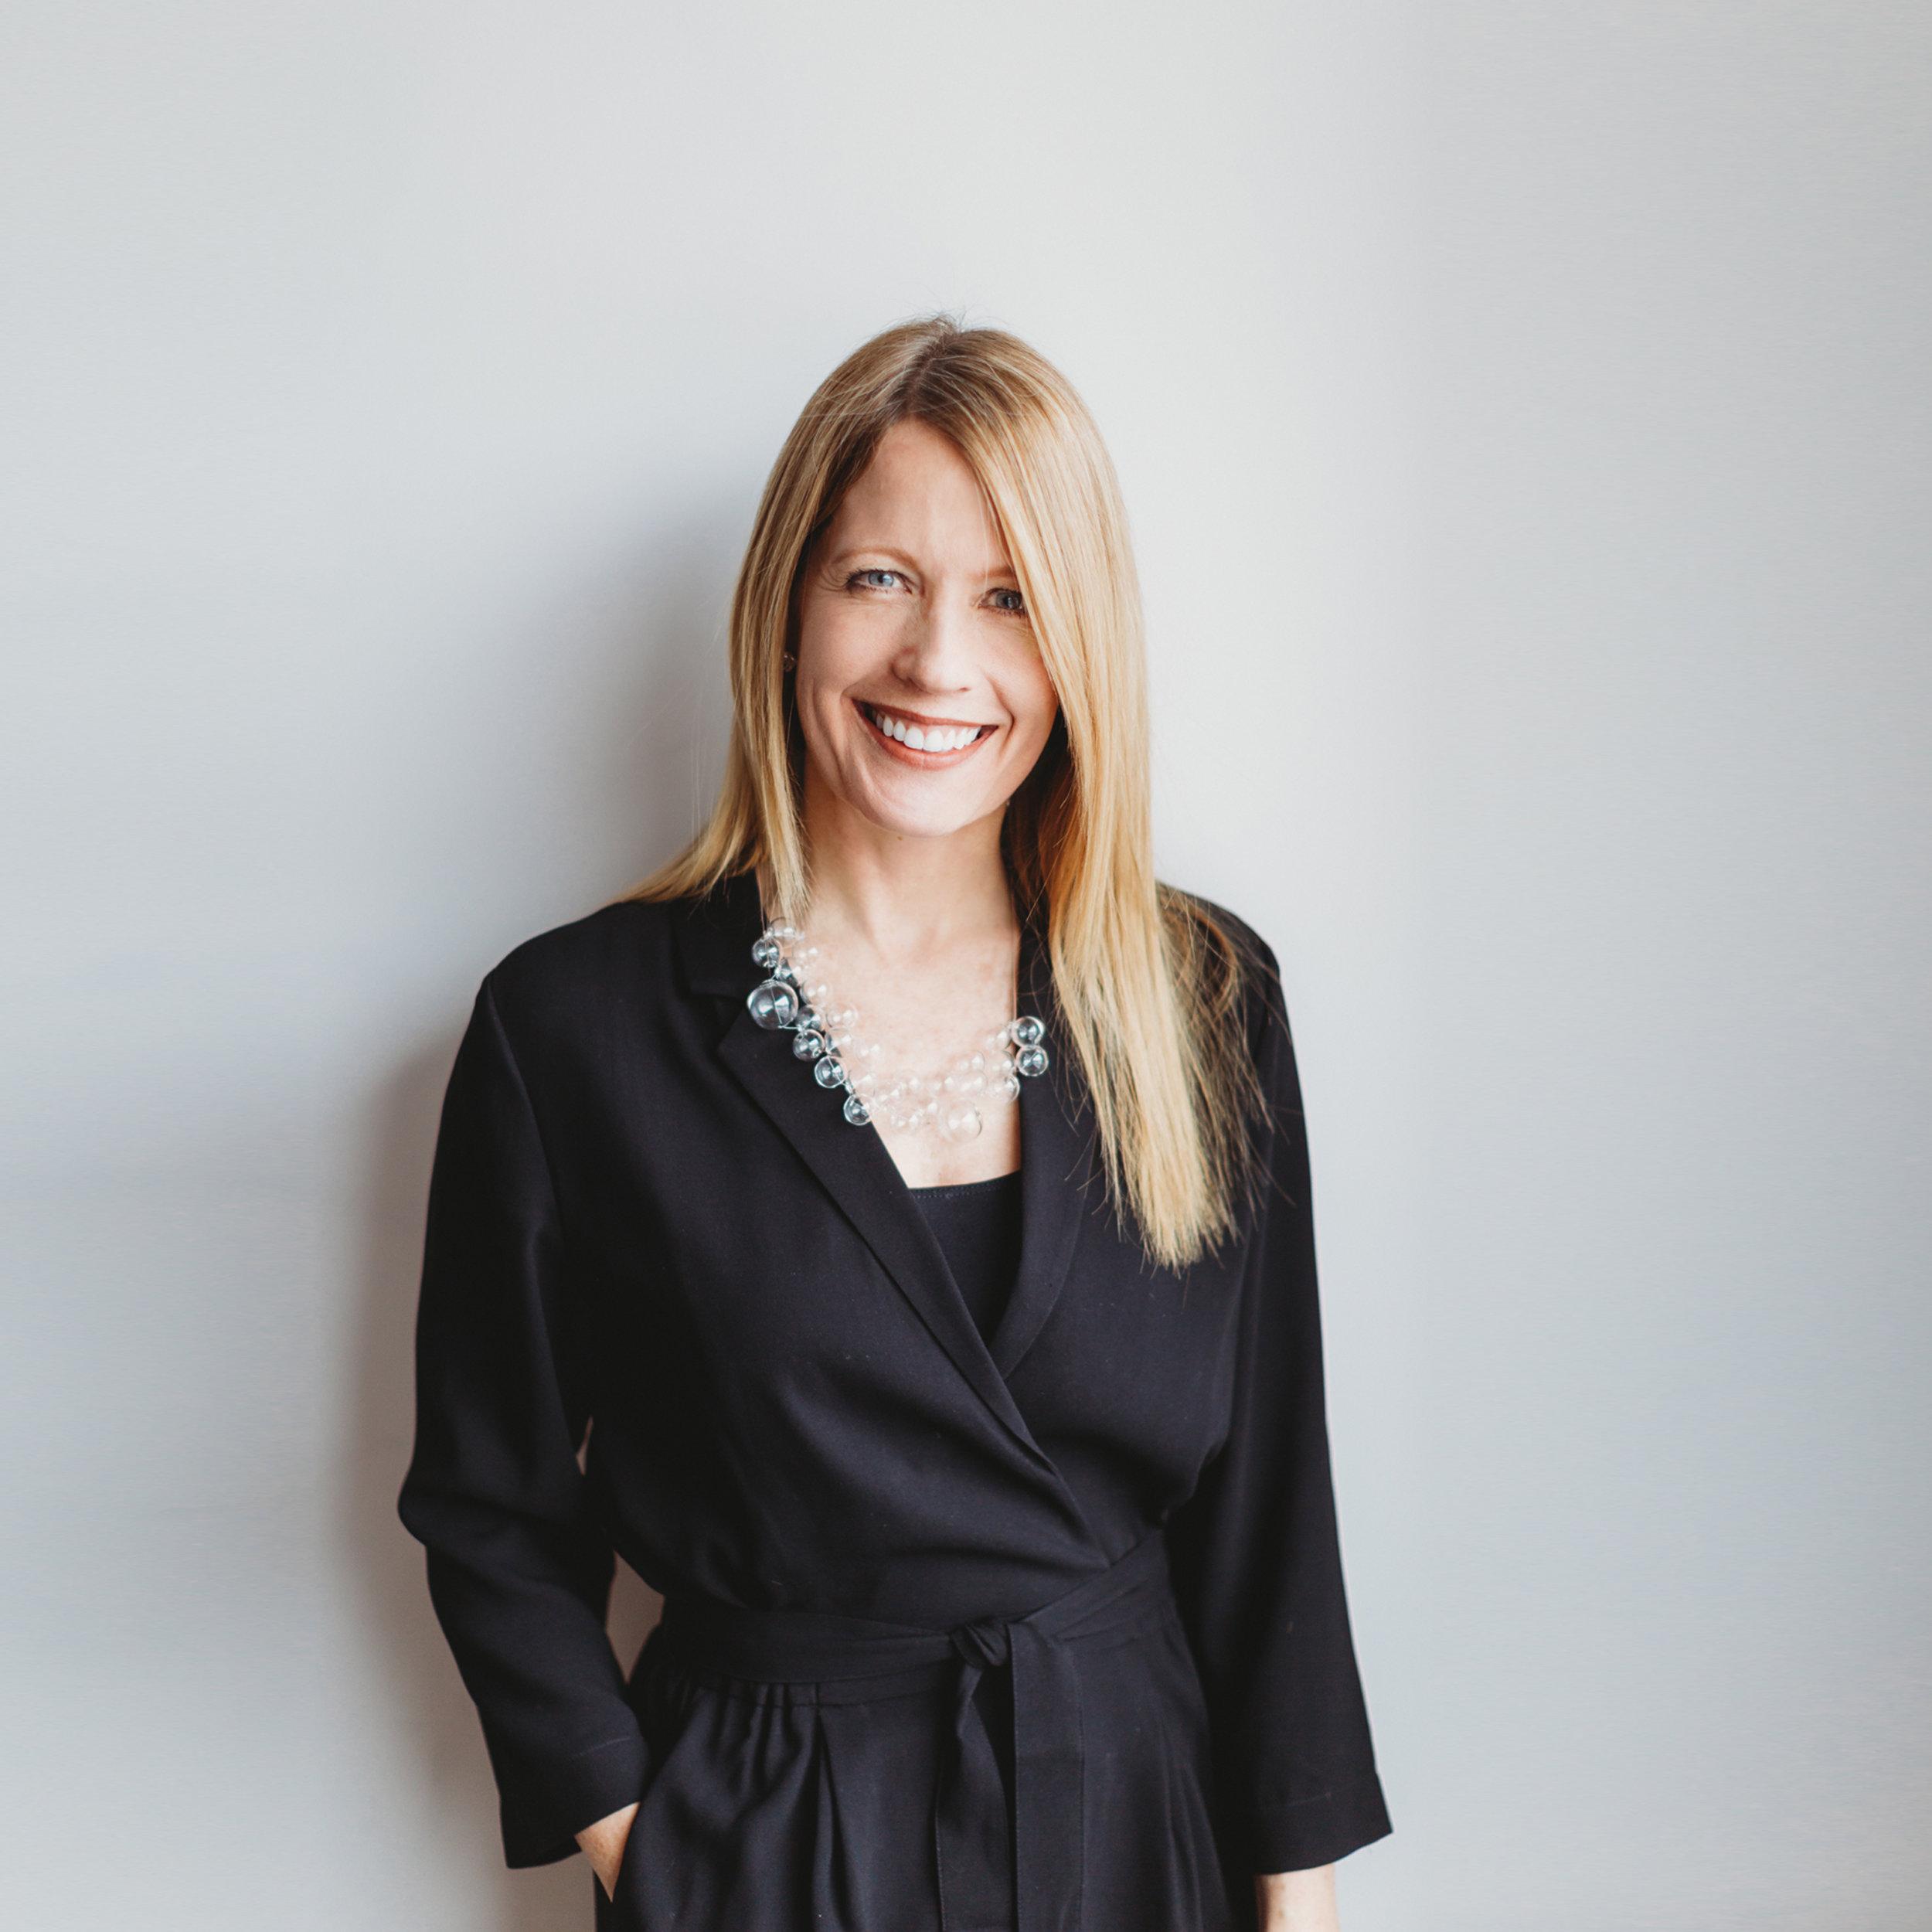 Dr. Alana Holt   Psychiatrist at The University of Saskatchewan